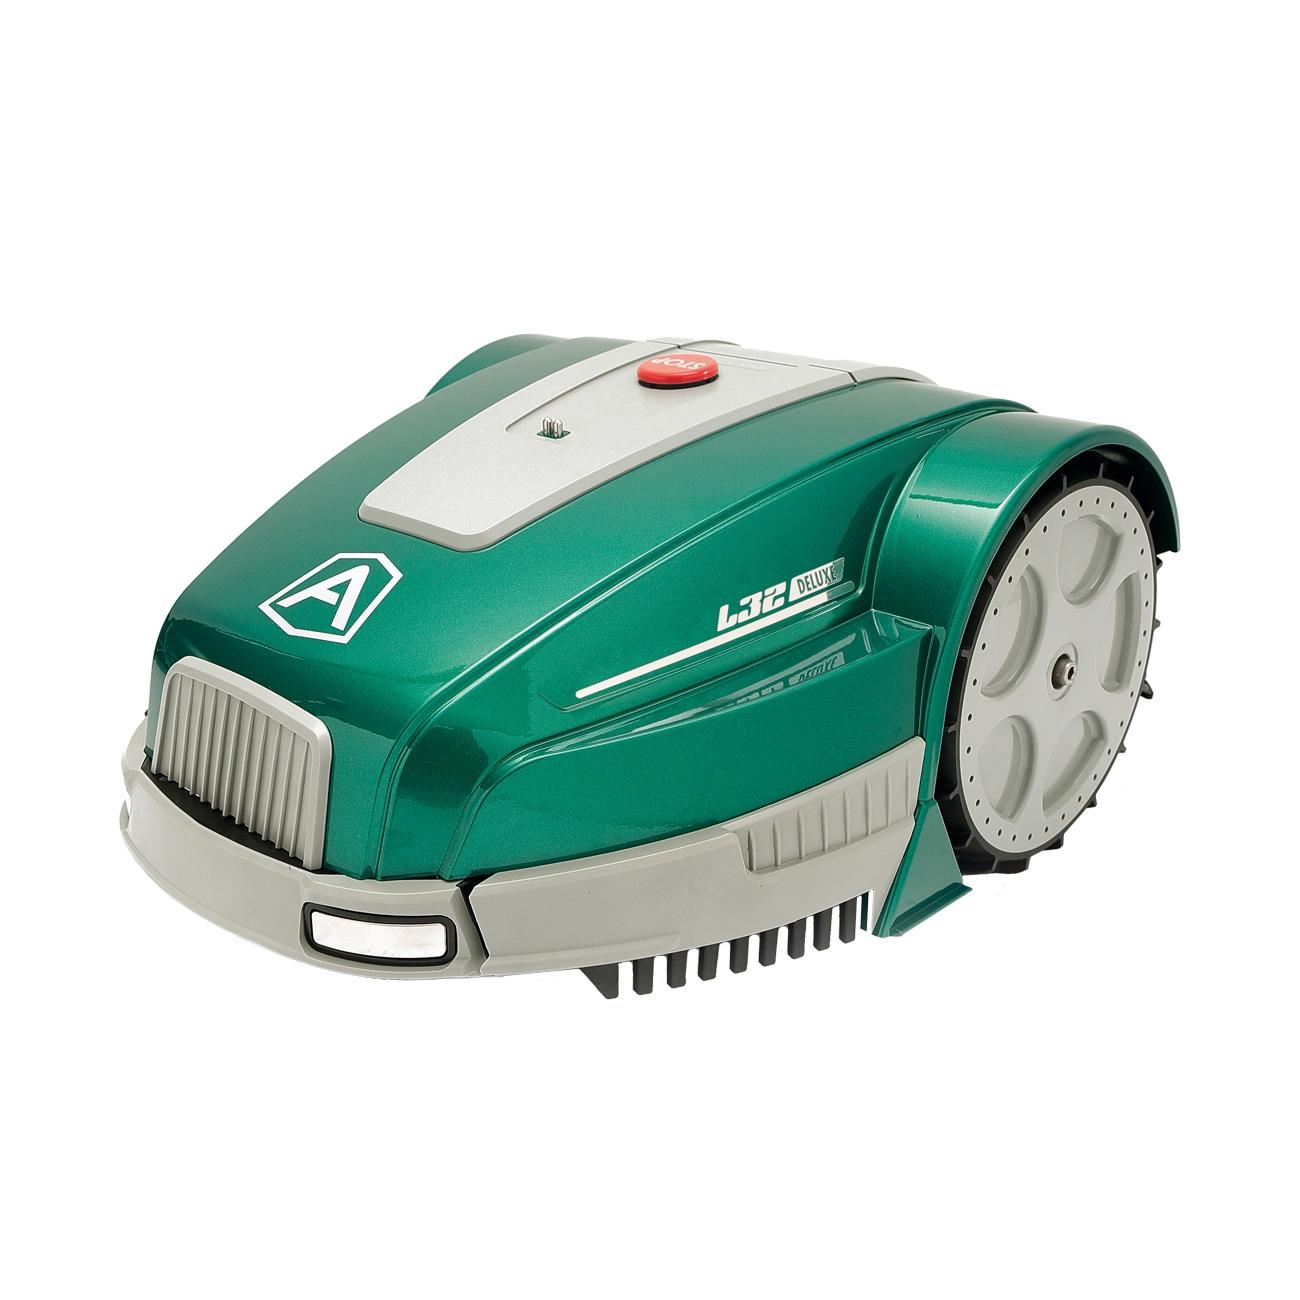 Image of Robot rasaerba Ambrogio L32 Deluxe New